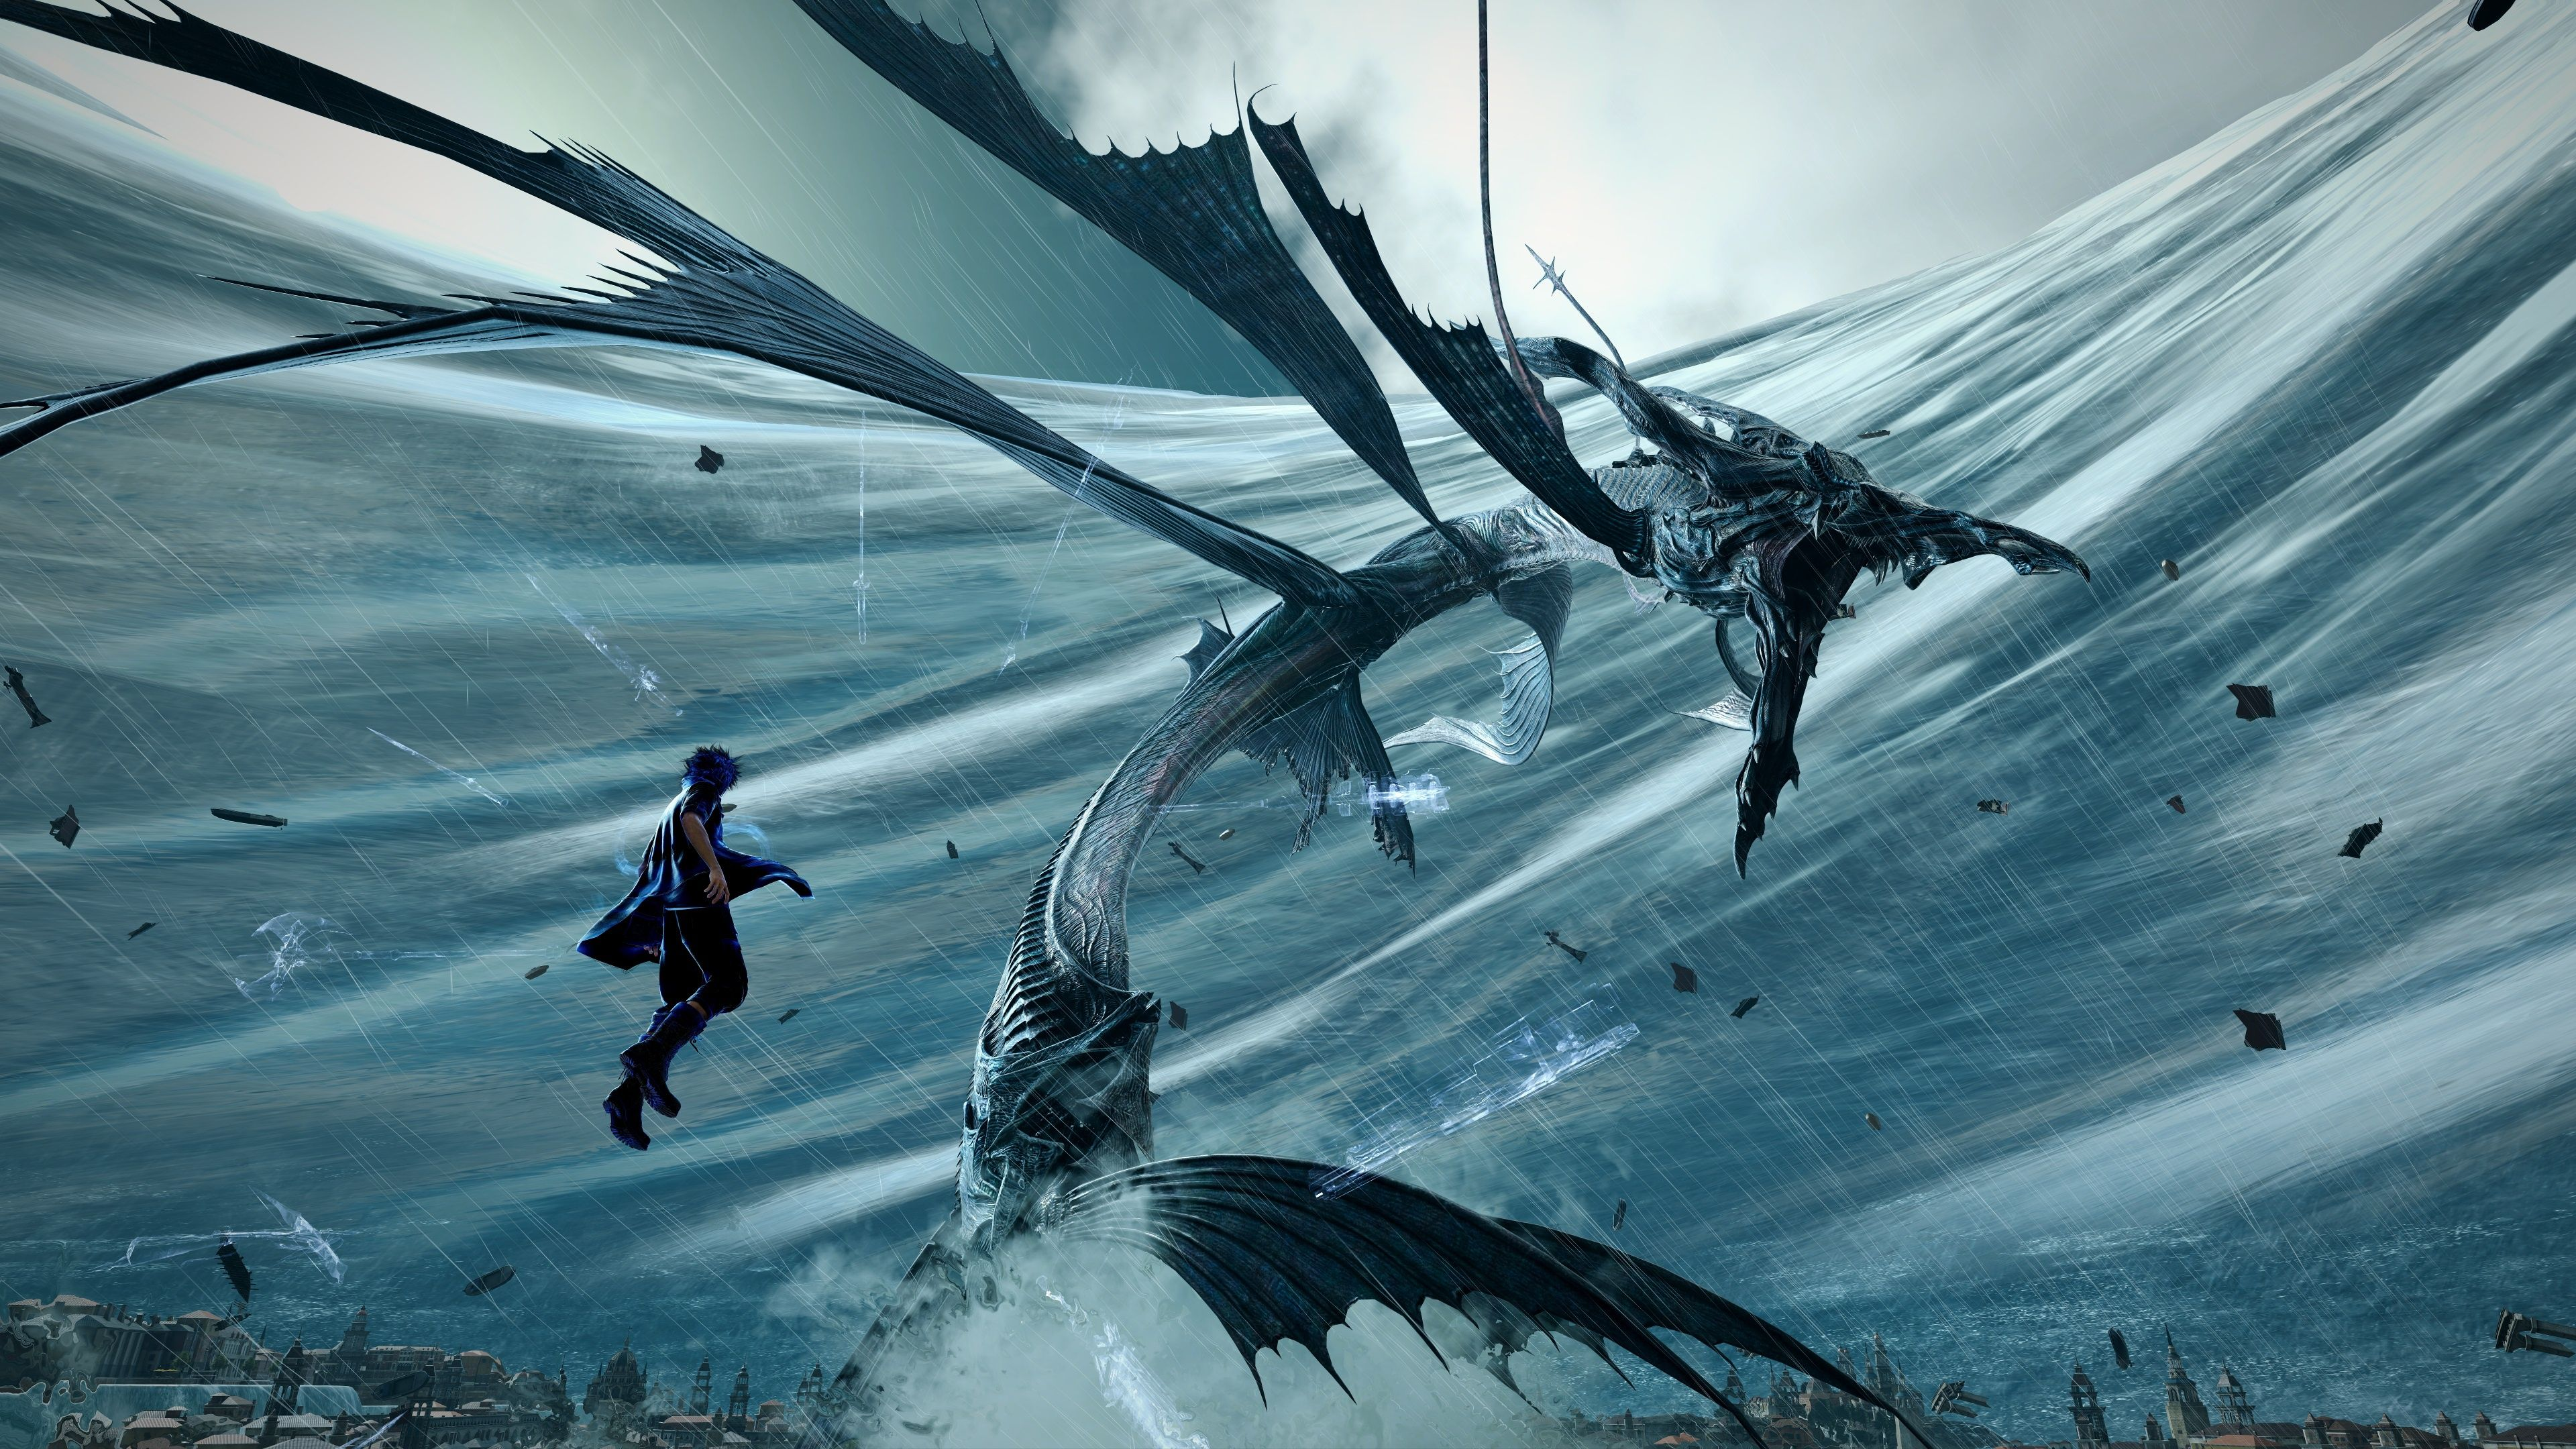 k Final Fantasy Xv HD Games k Wallpapers Images Backgrounds